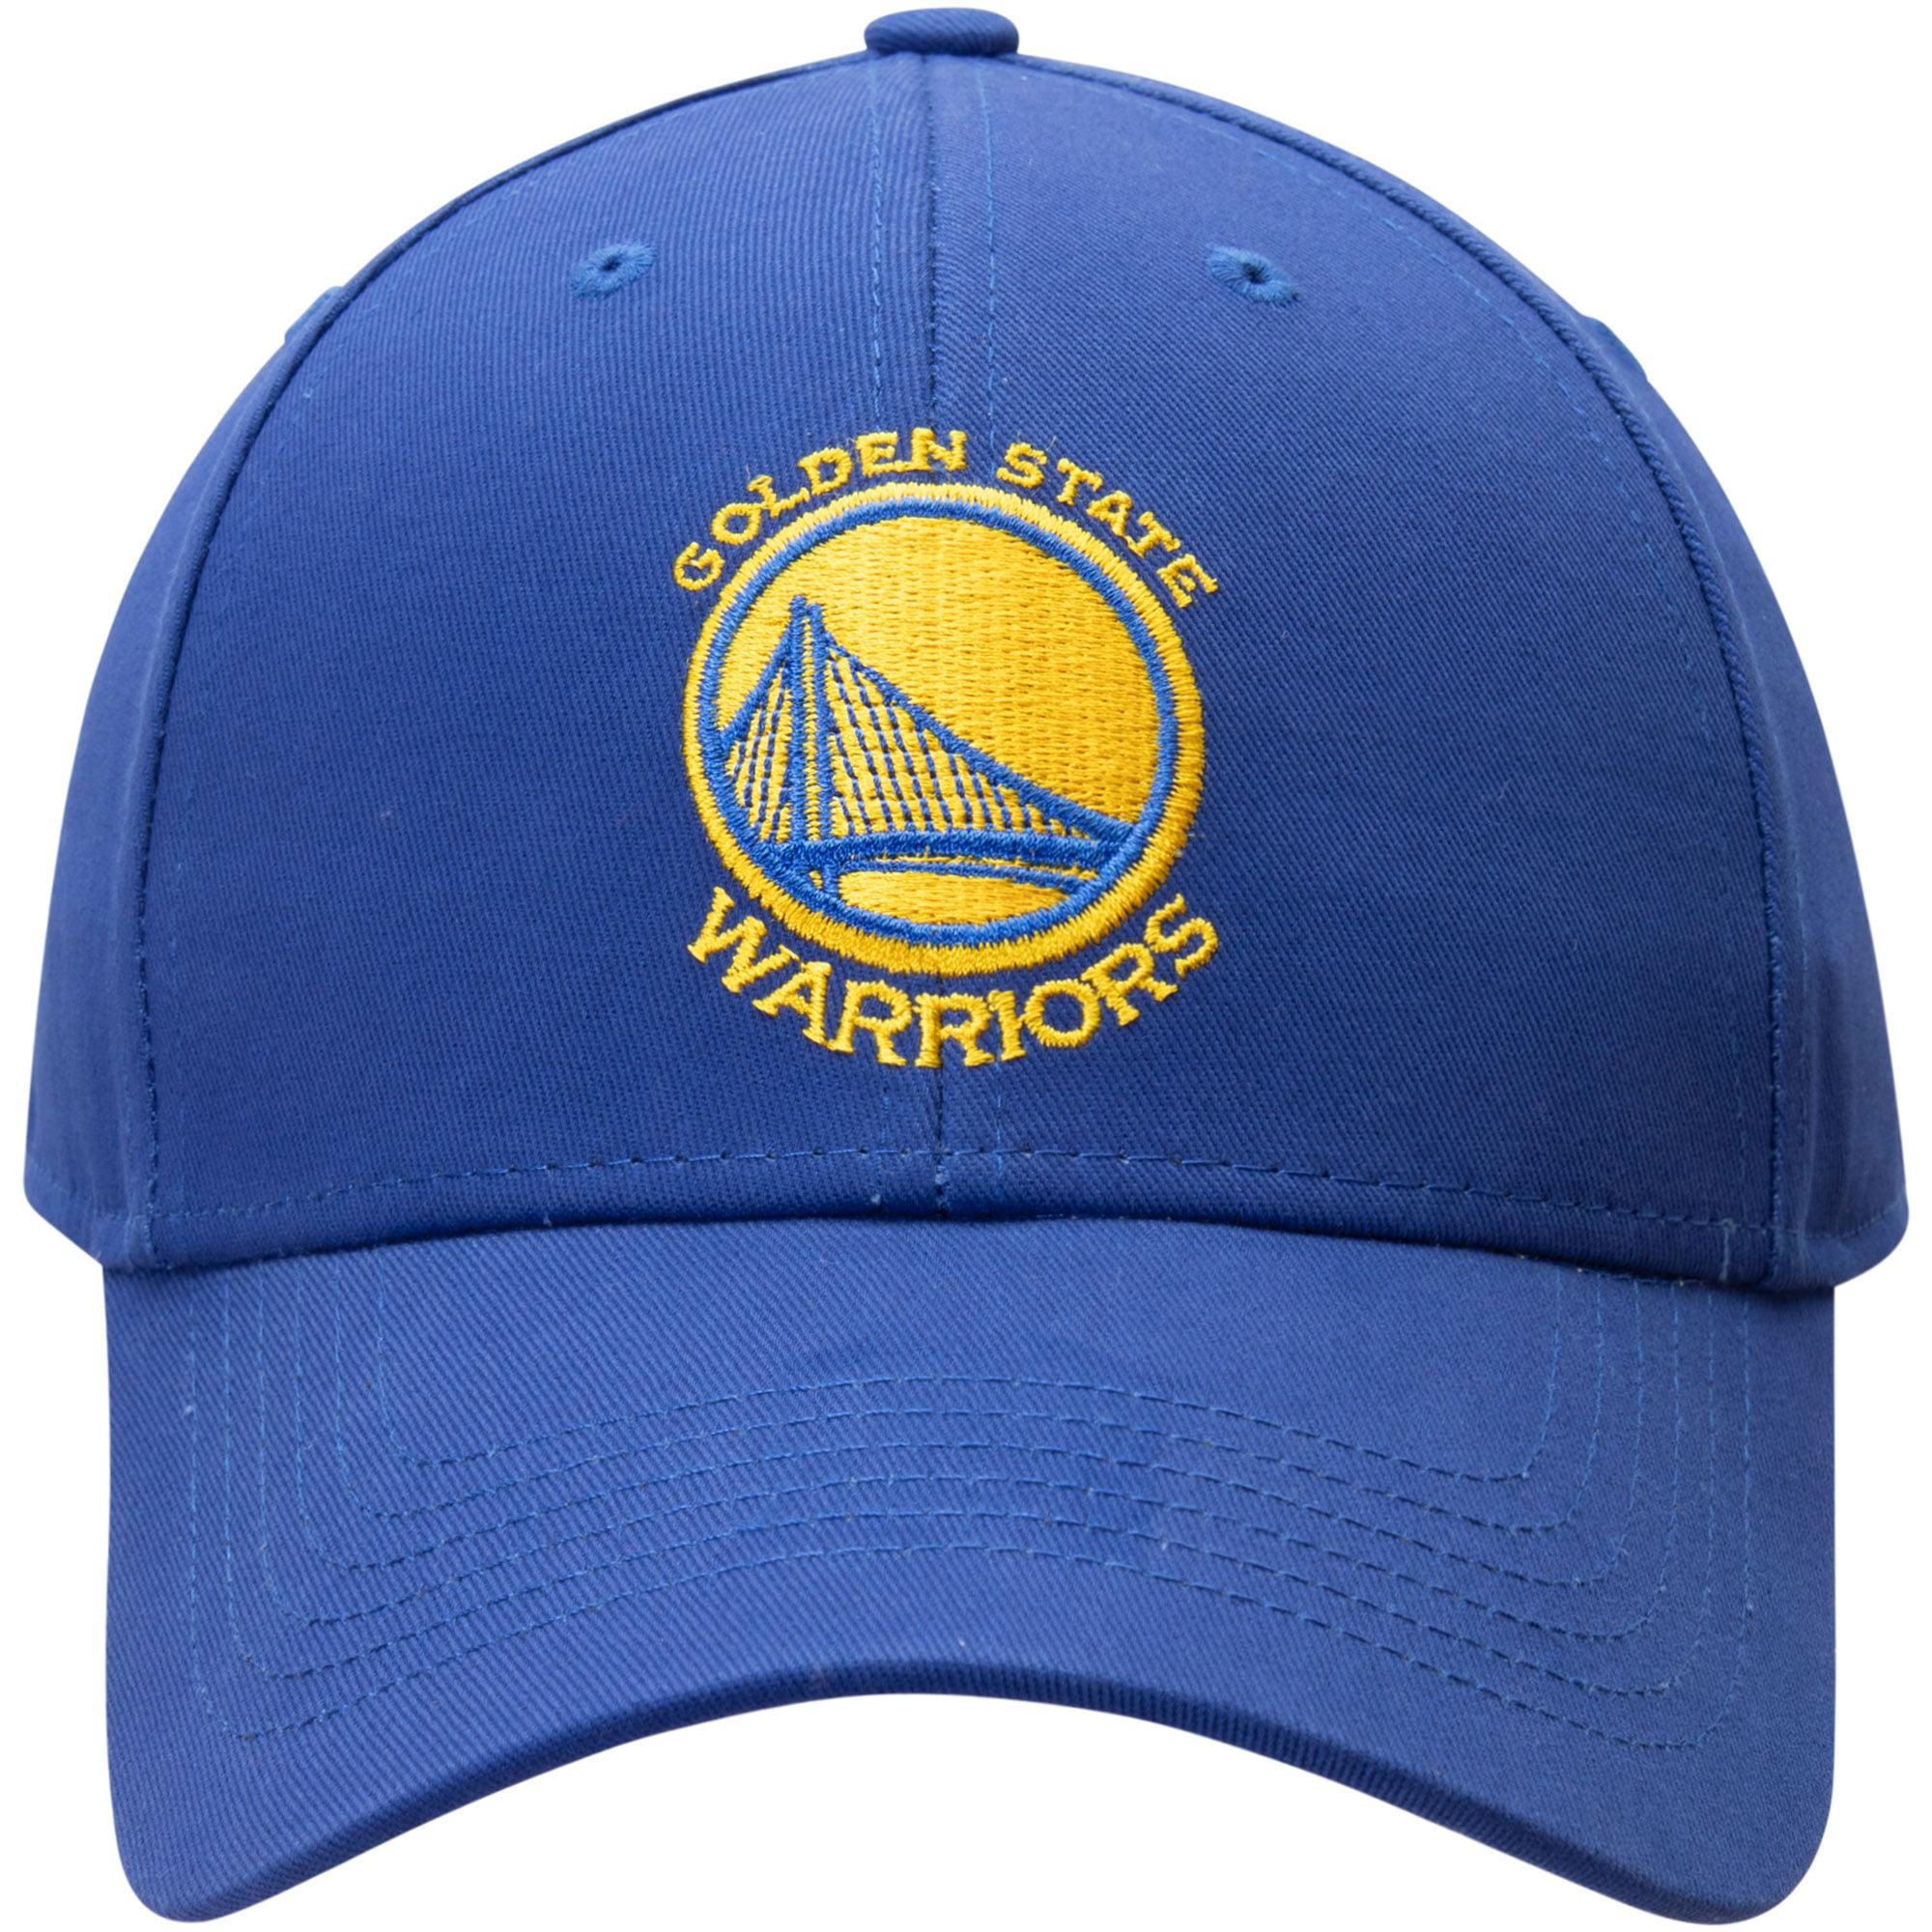 3dbf08de0559ee NBA Golden State Warriors Basic Cap/Hat - Fan Favorite - Walmart.com